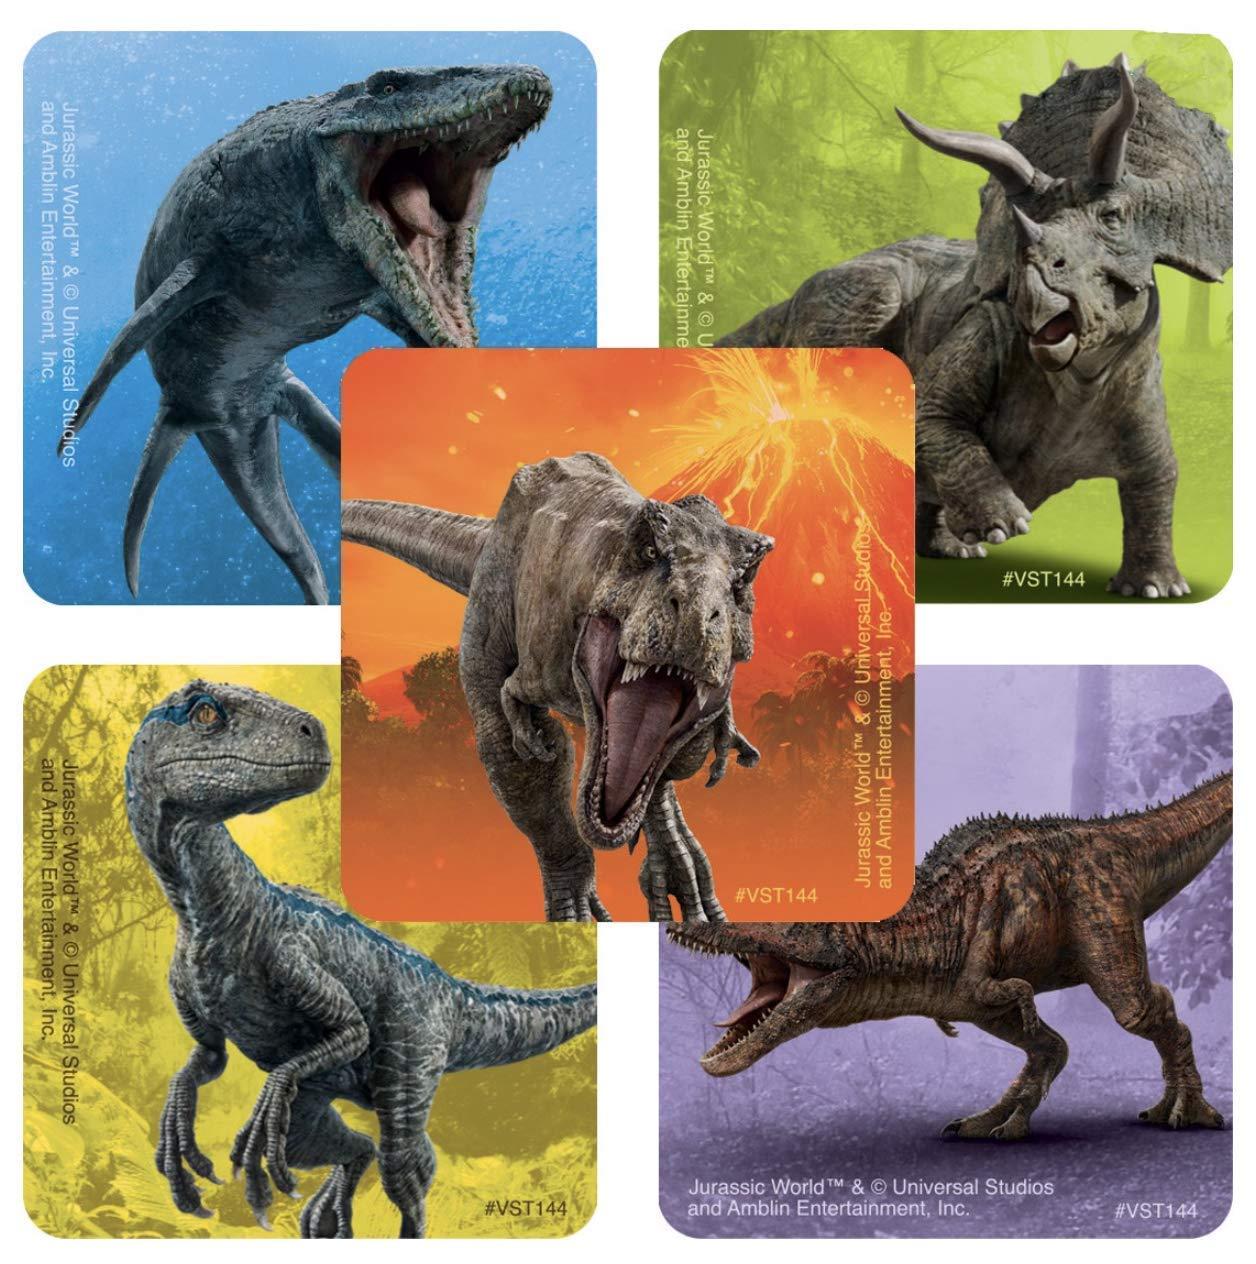 Legacy Jurassic Dinosaurs World Trucks Fossil Ian Malcolm /& Grant Action Figure Model Island Transport Collection Matchbox Die-Cast Dino Rivals series Tricera-Tracker /& Bonus stickers 3 items Alan Dr